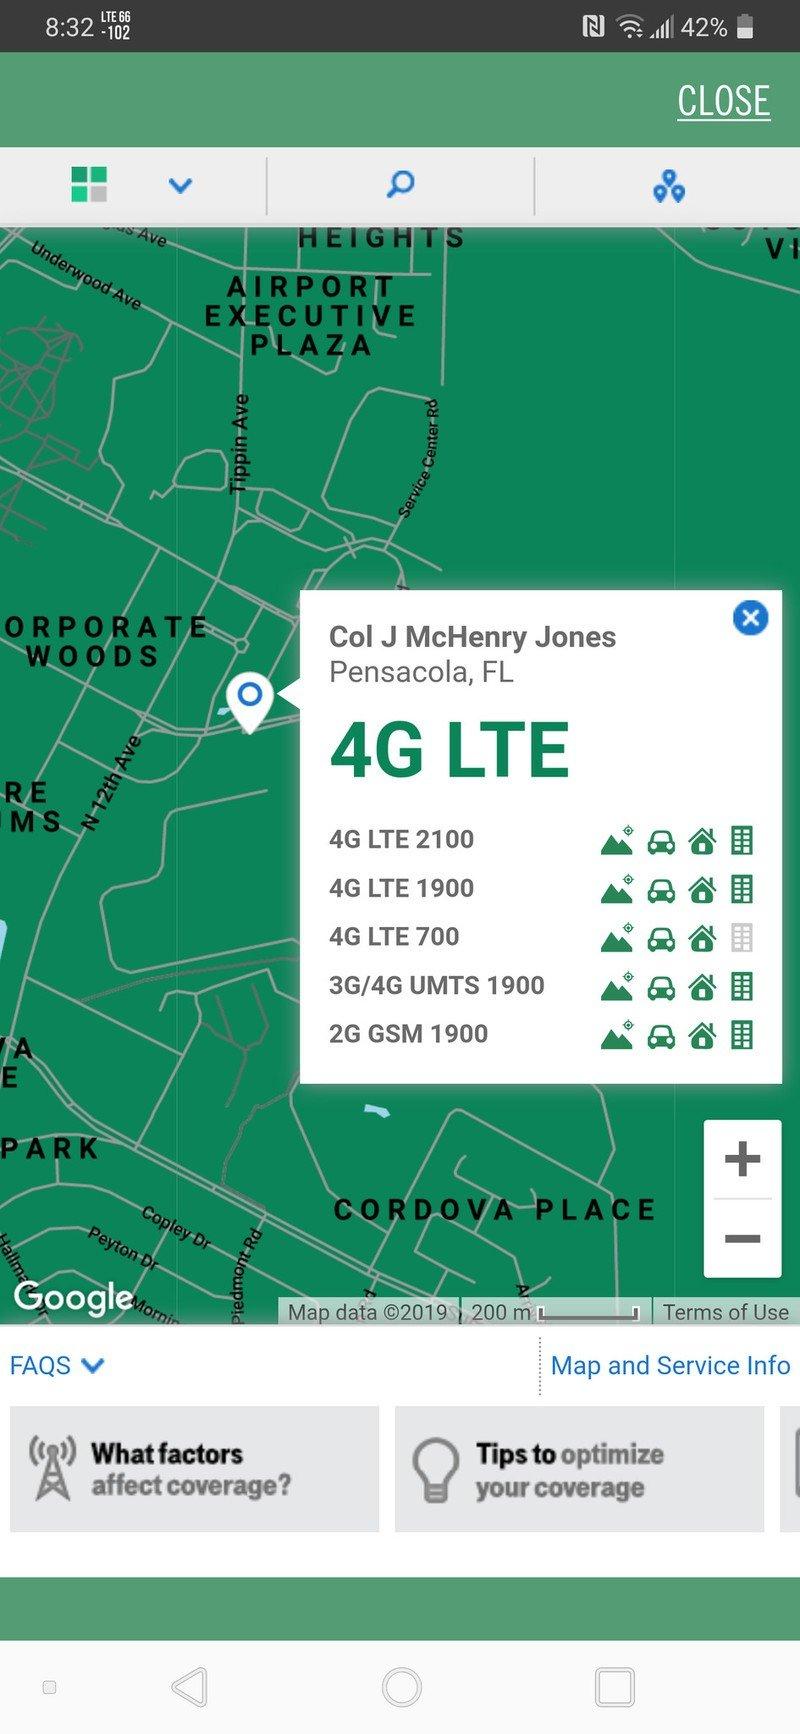 mint-mobile-coverage-map-app-nov19.jpg?i